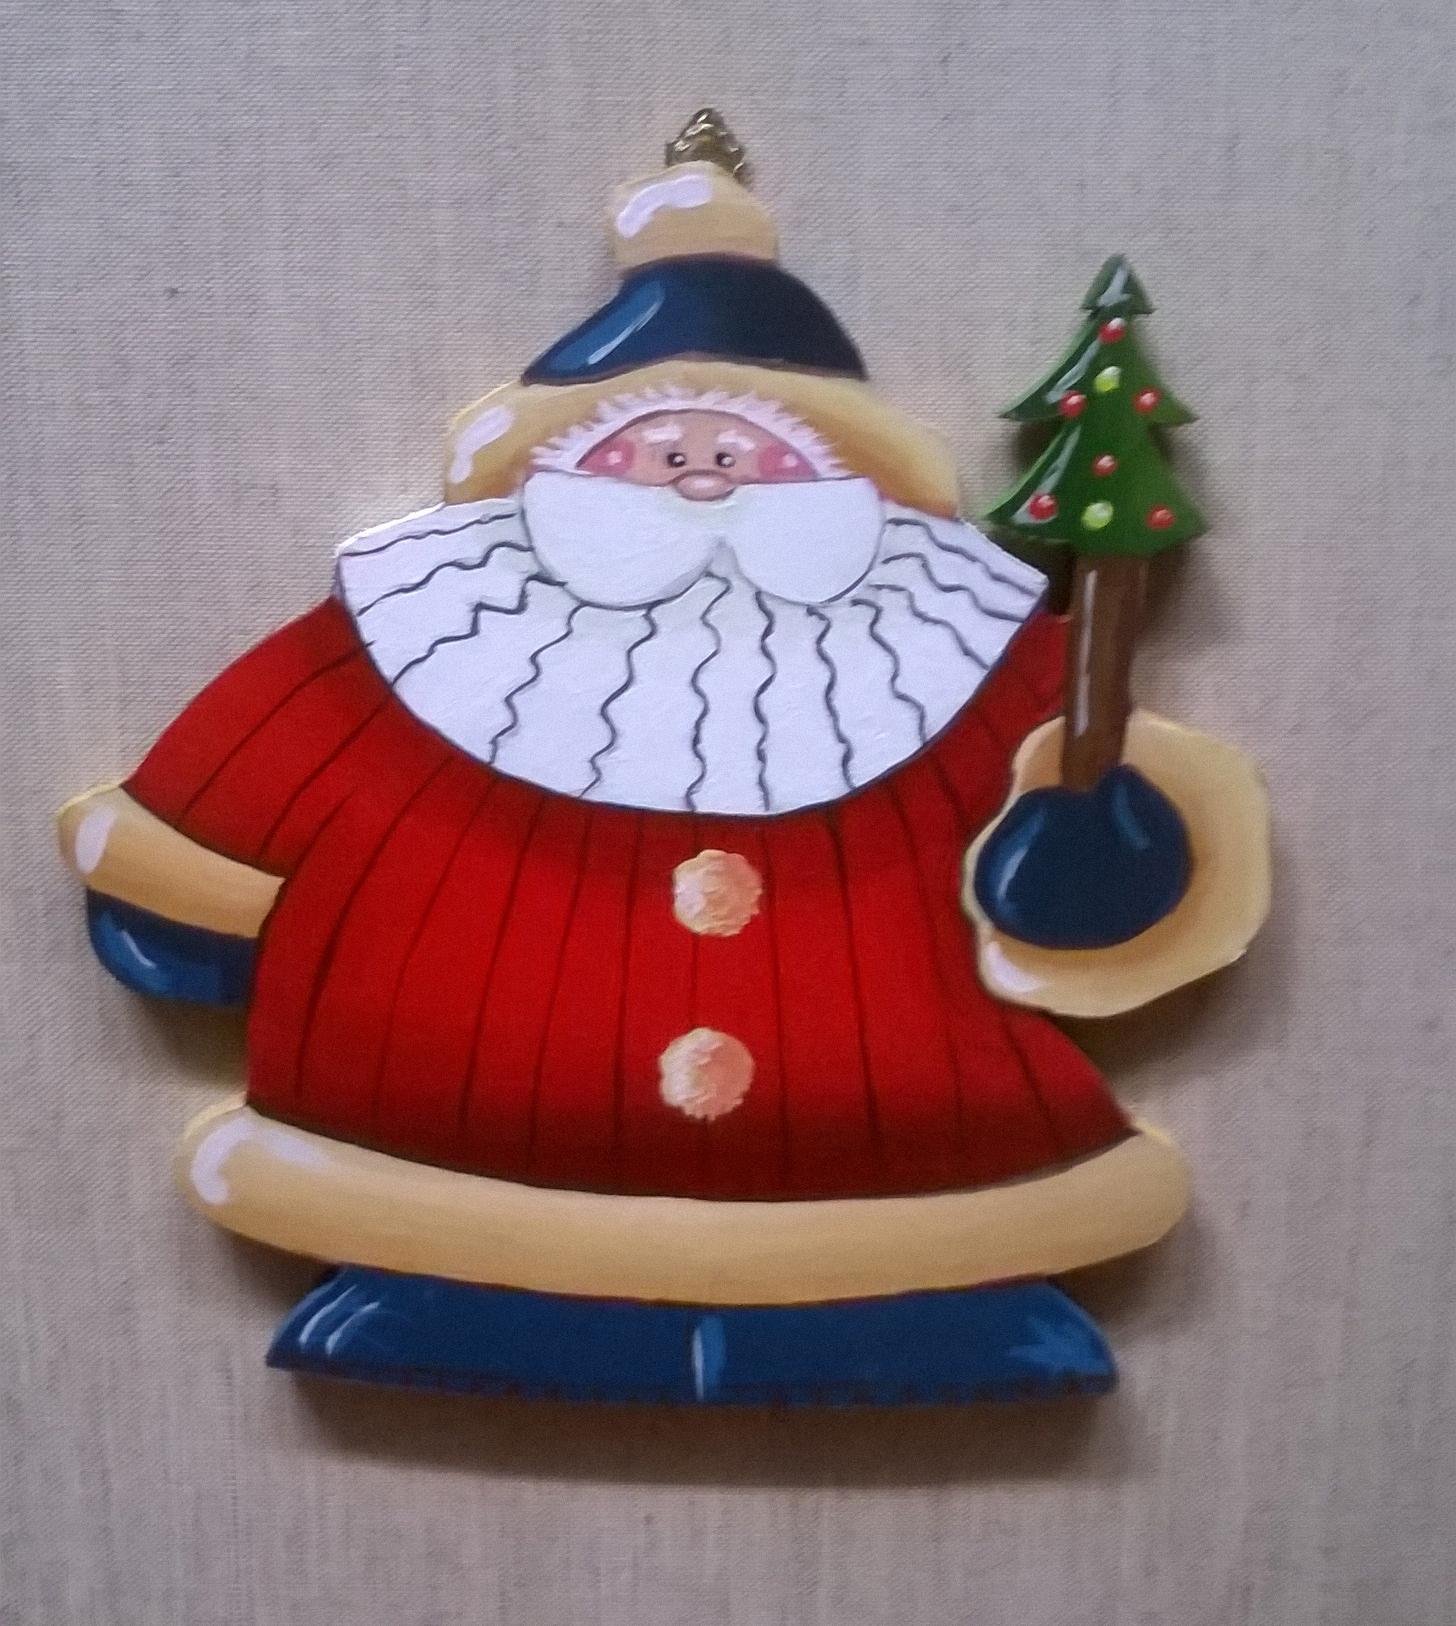 Christmas decor (tree)